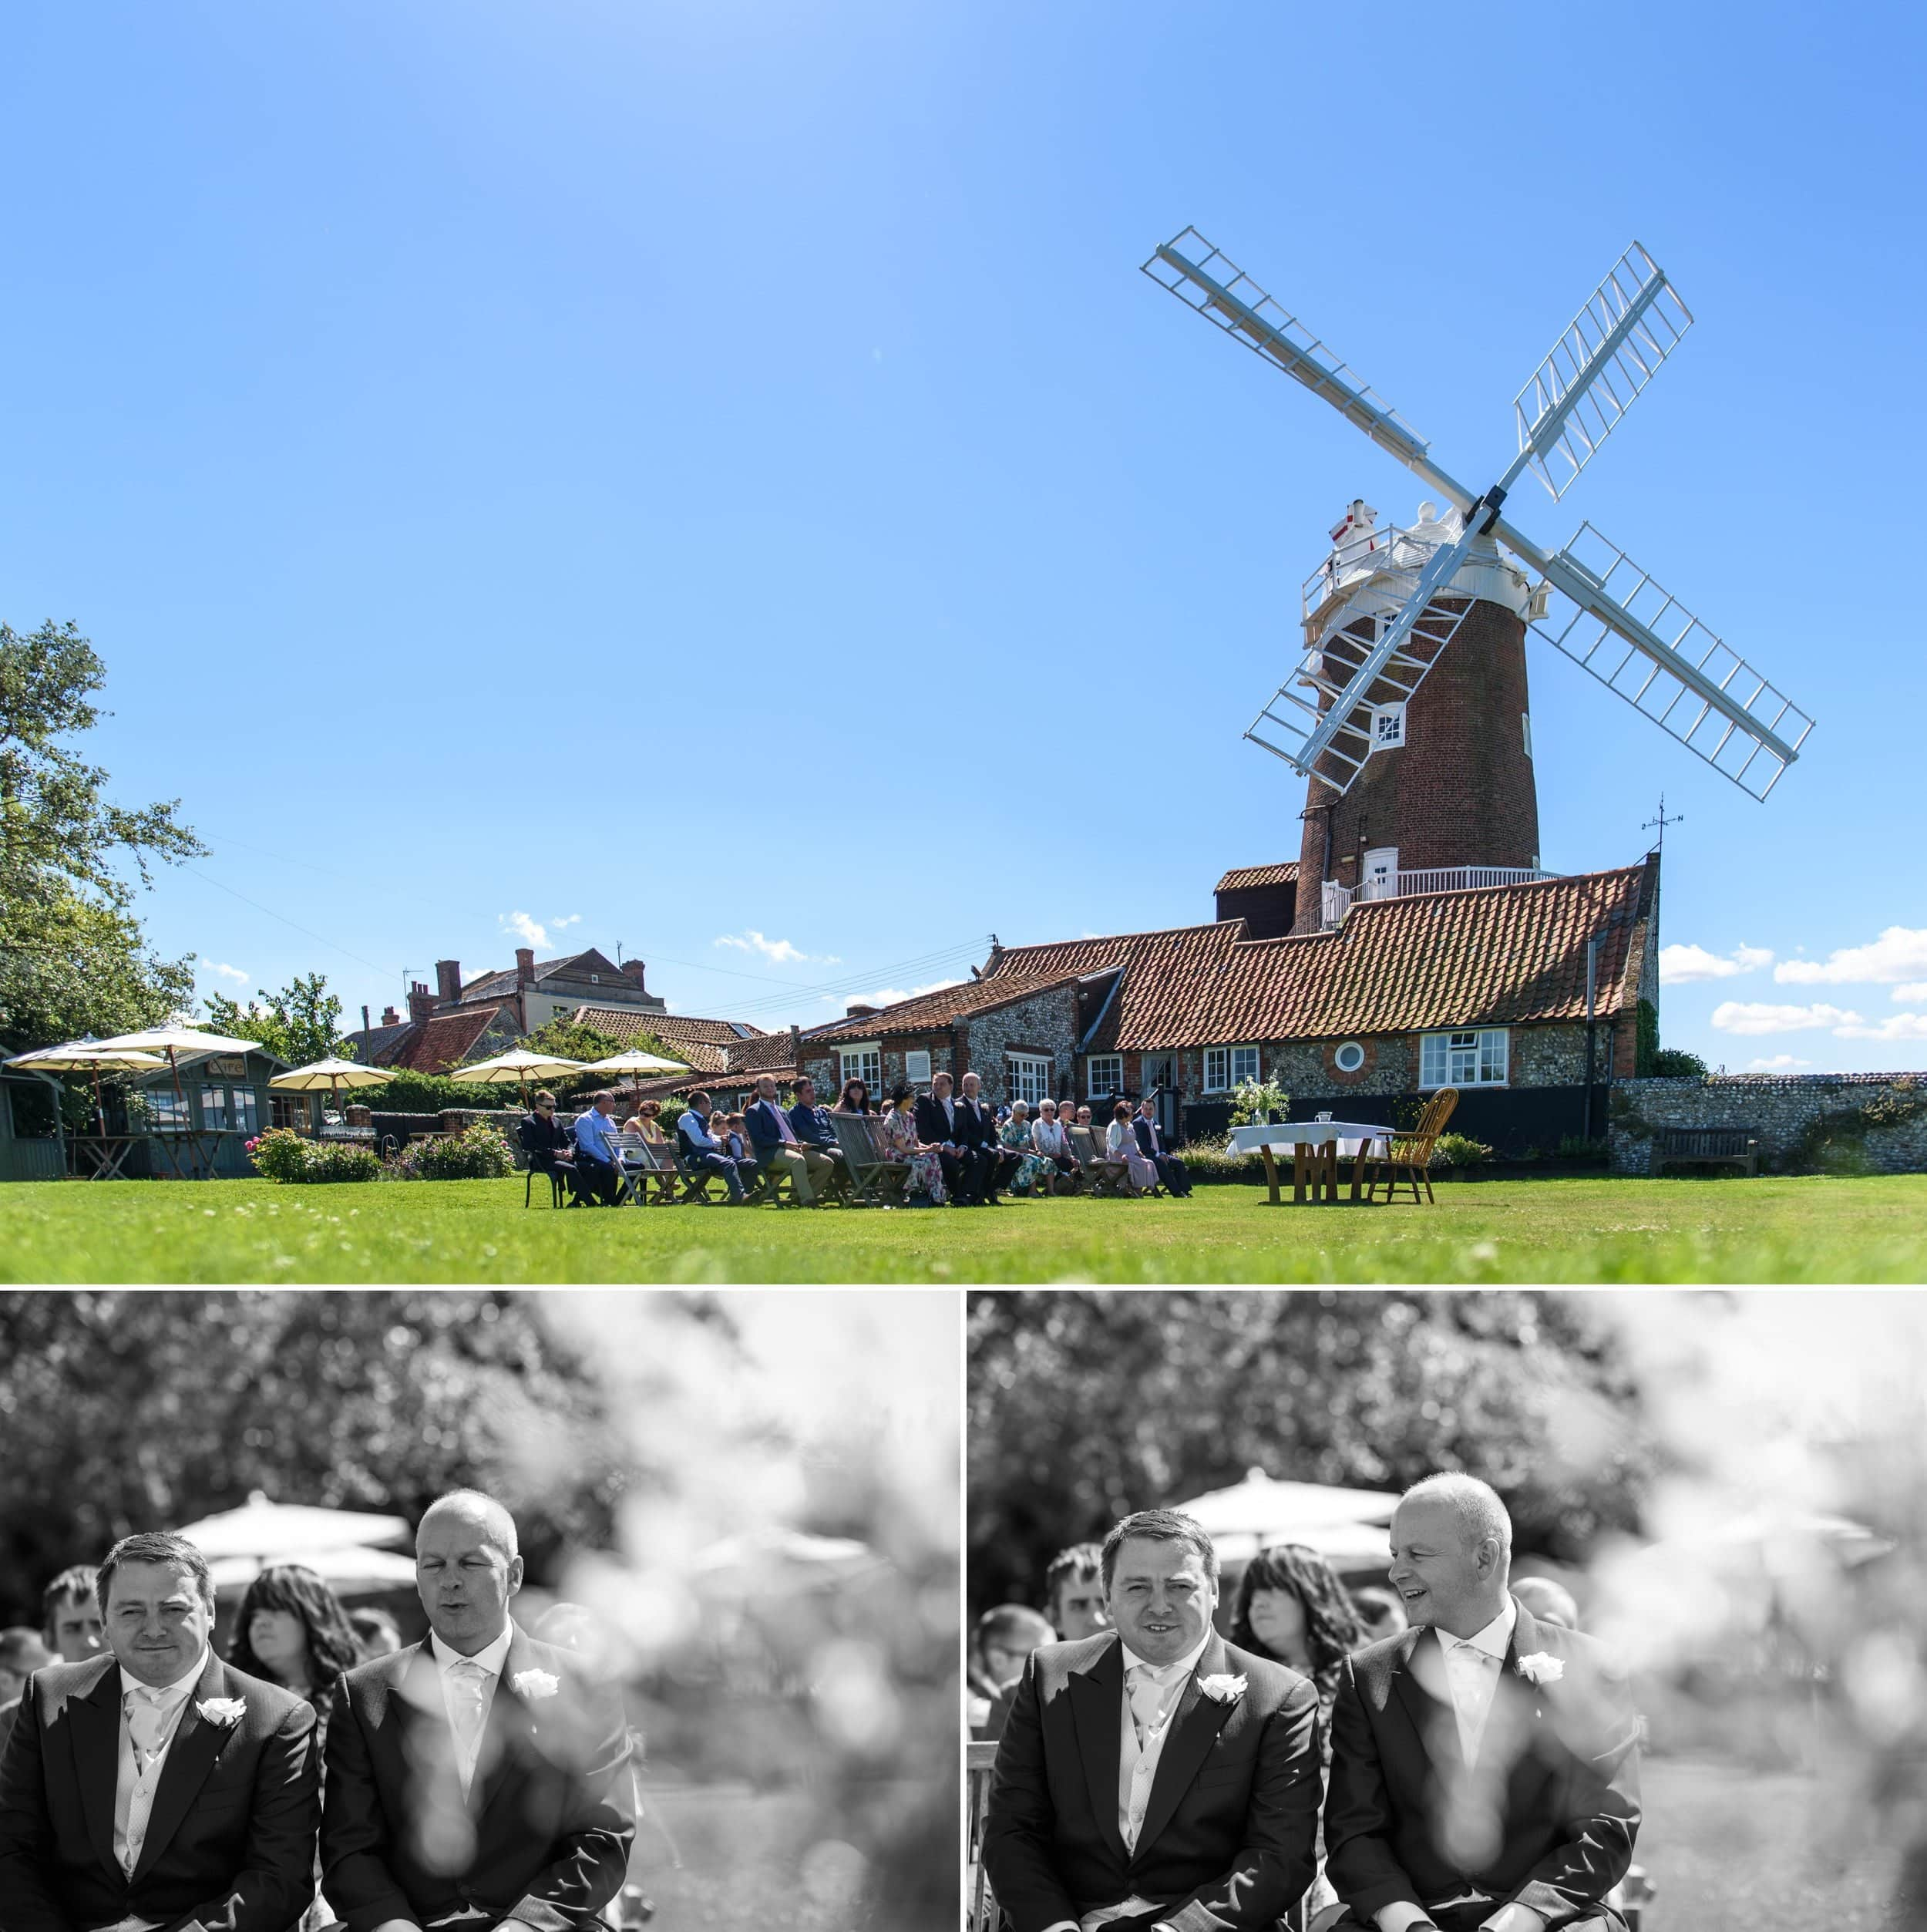 cley_windmill_norfolk_wedding_photography-5